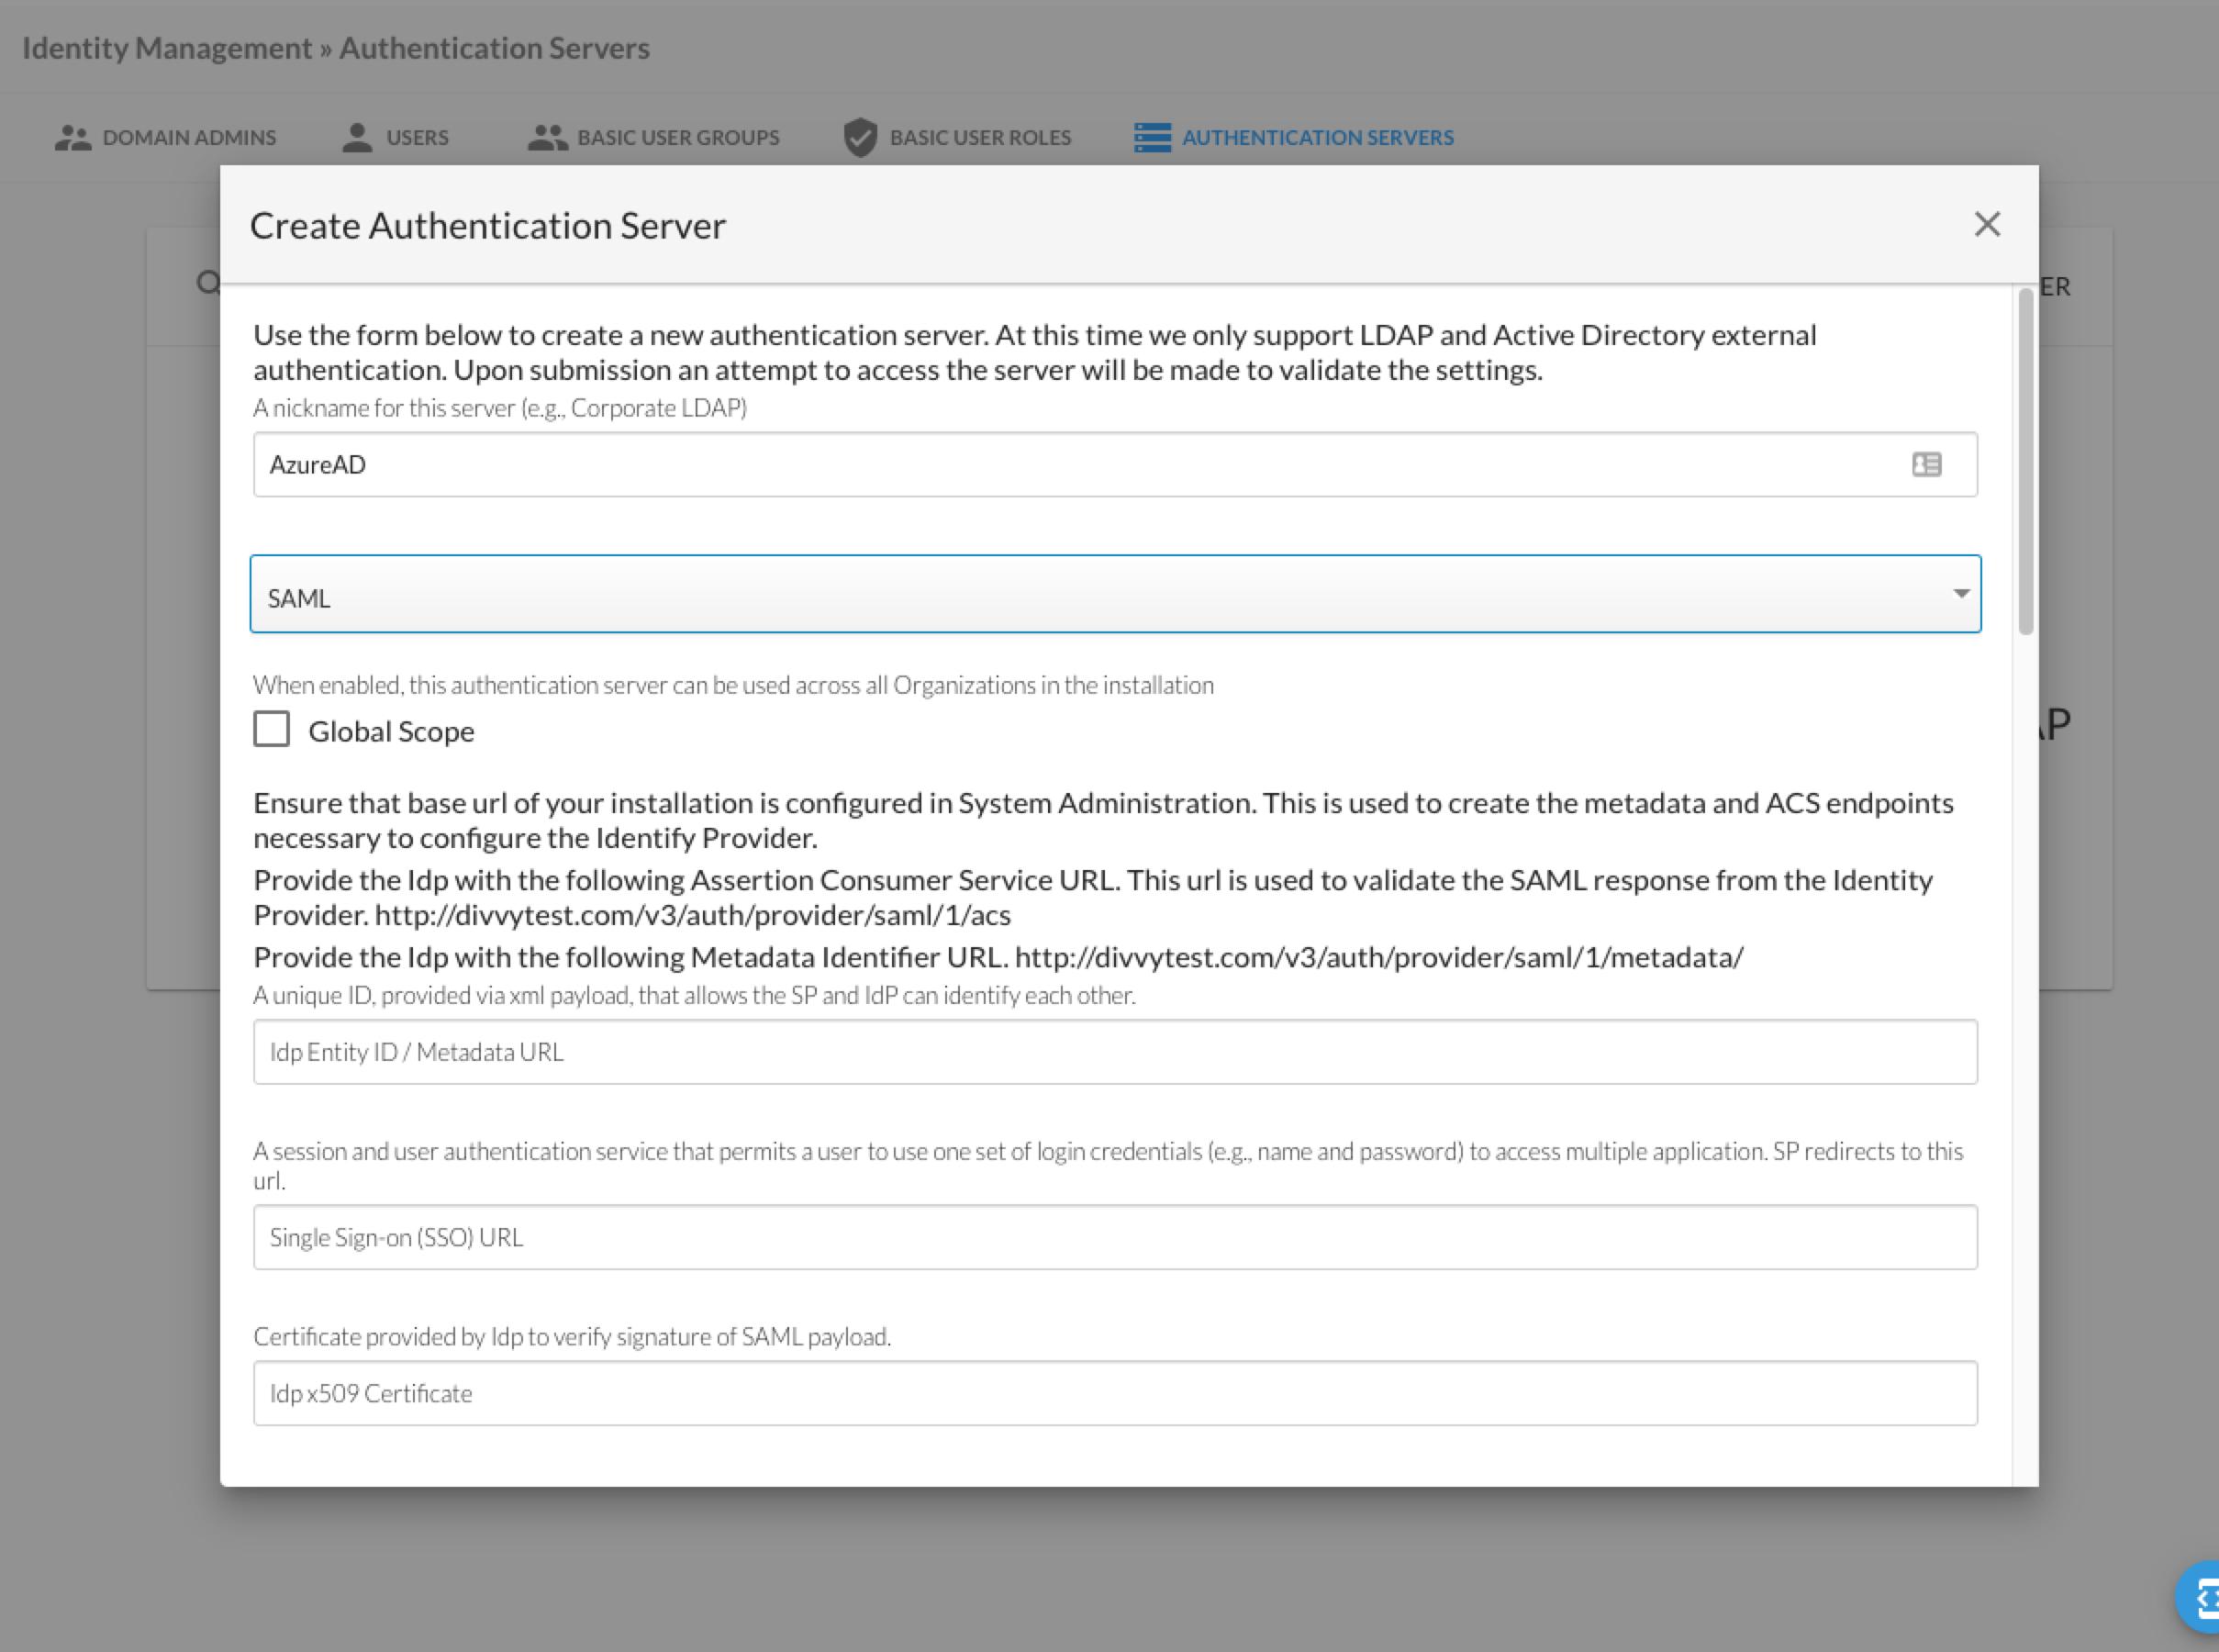 Create Authentication Server Menu